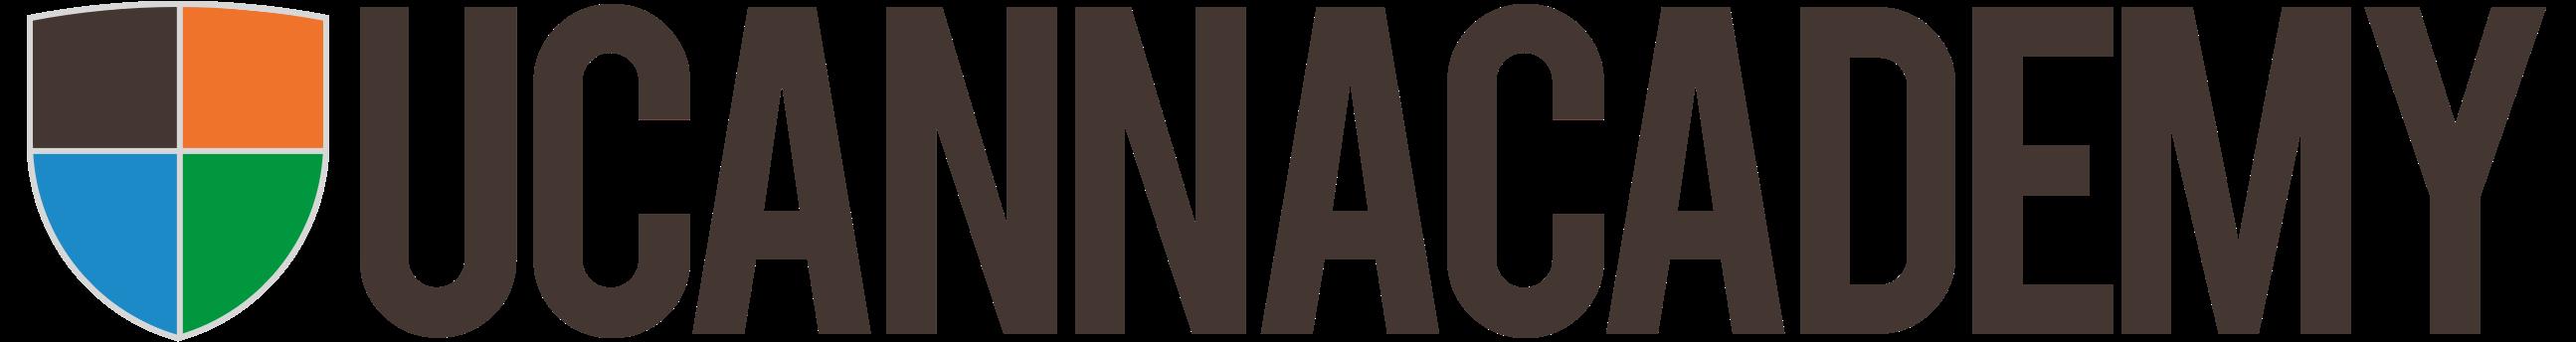 UCannAcademy